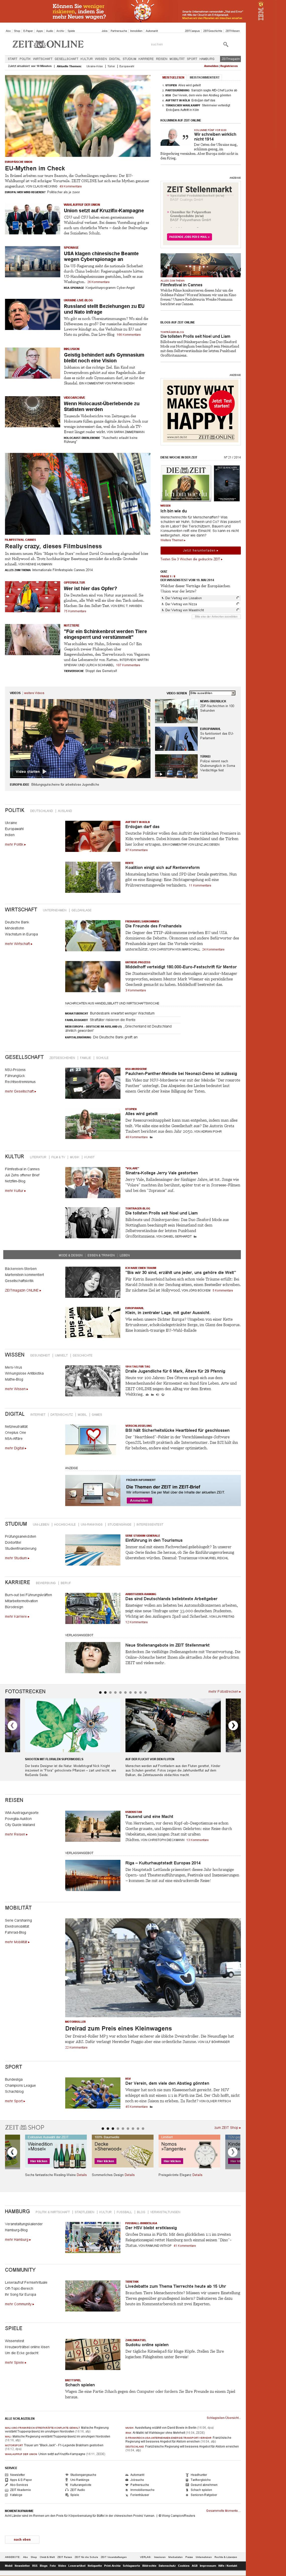 Zeit Online at Monday May 19, 2014, 2:25 p.m. UTC